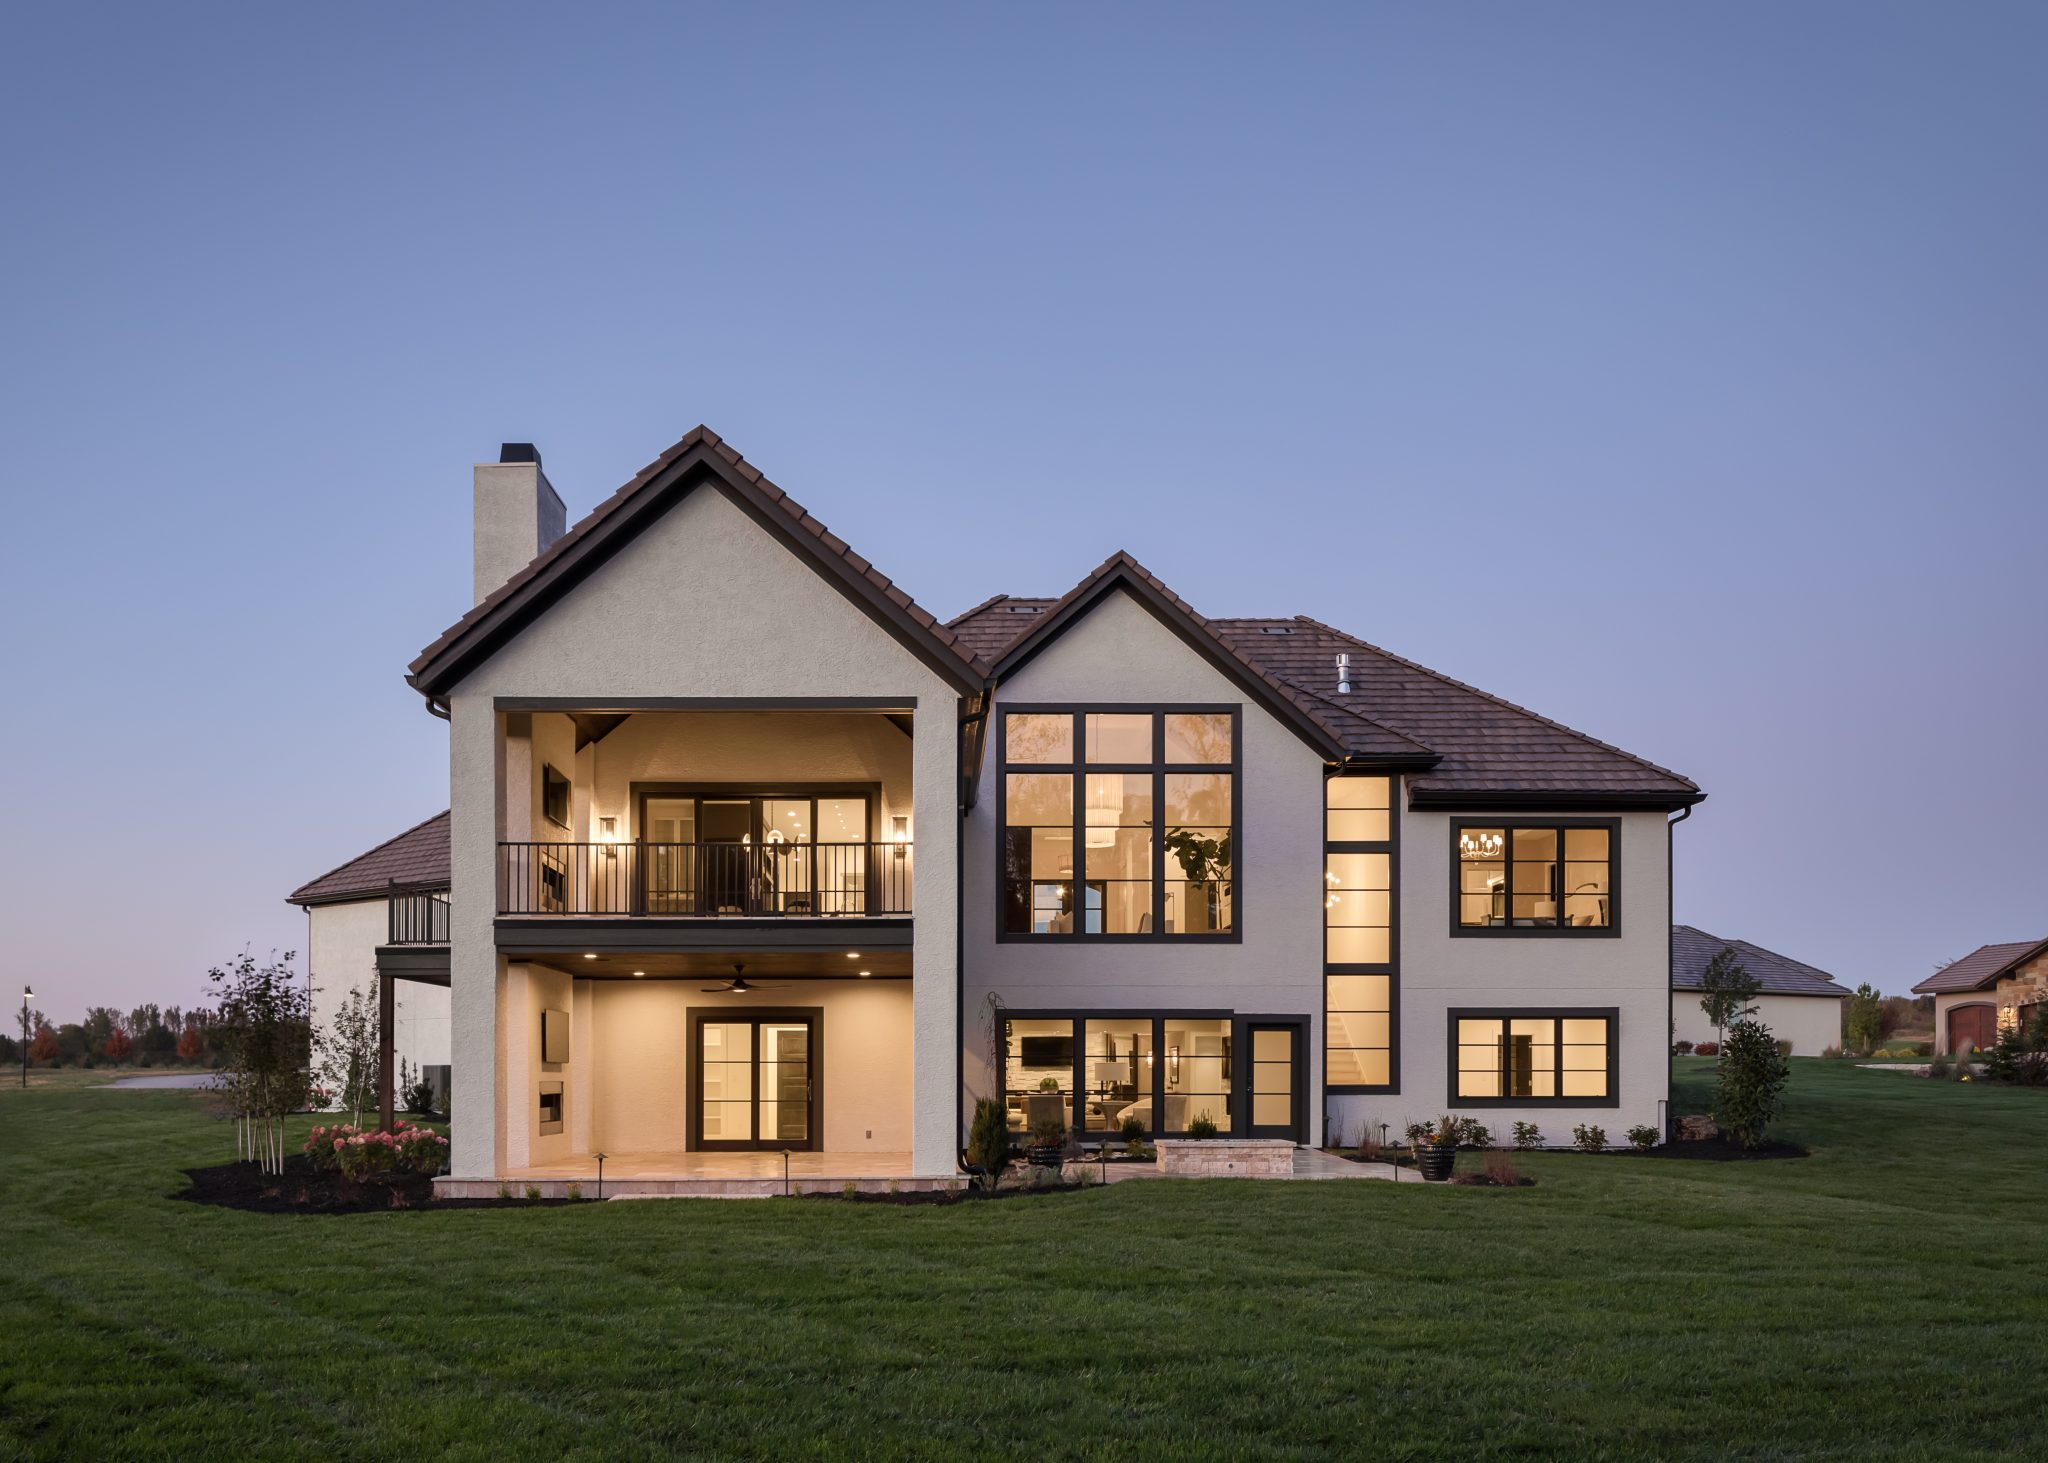 Custom built home exterior outside view